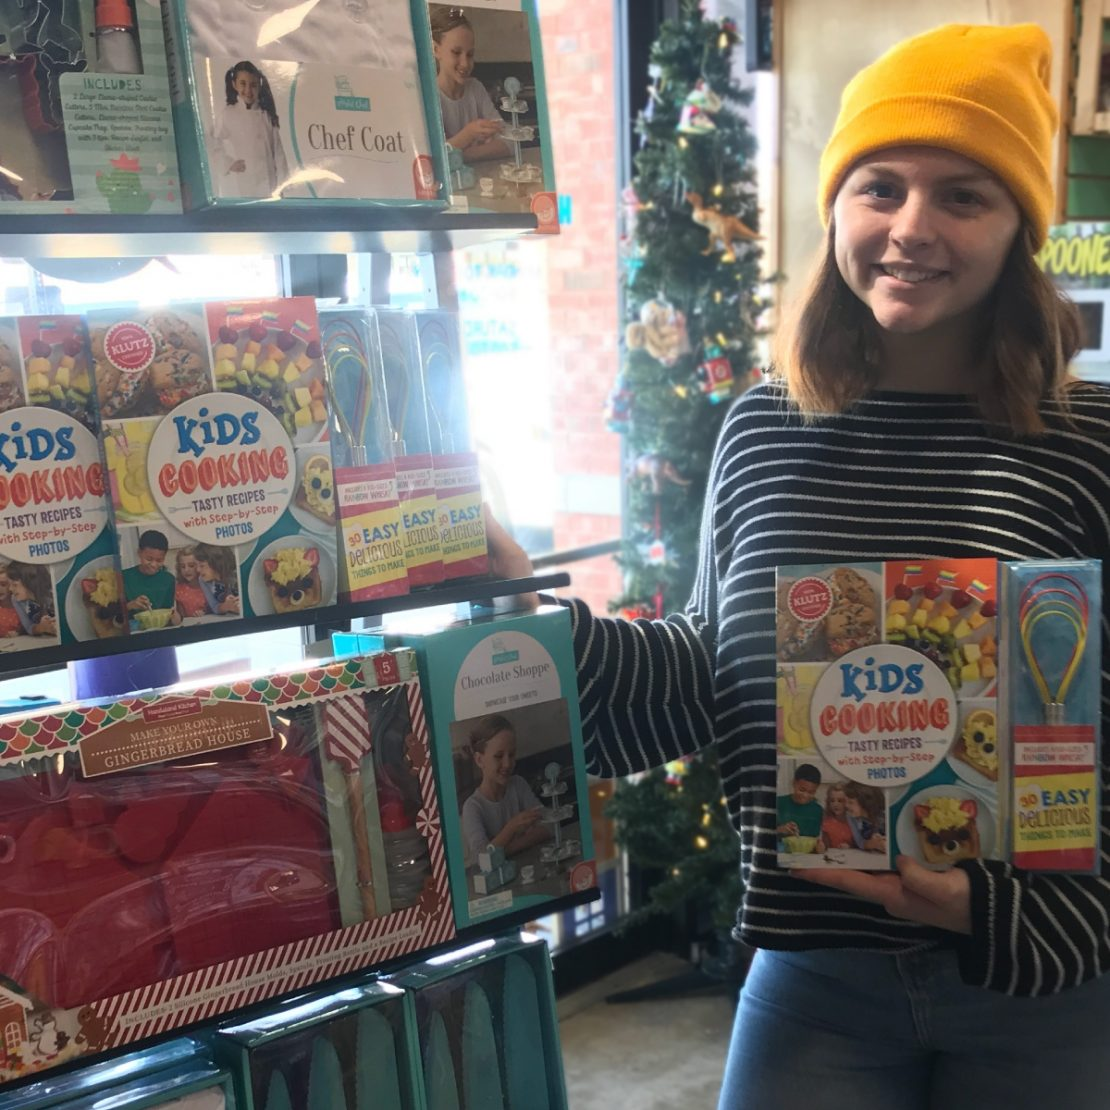 Baking Kits, Carlee's Pick